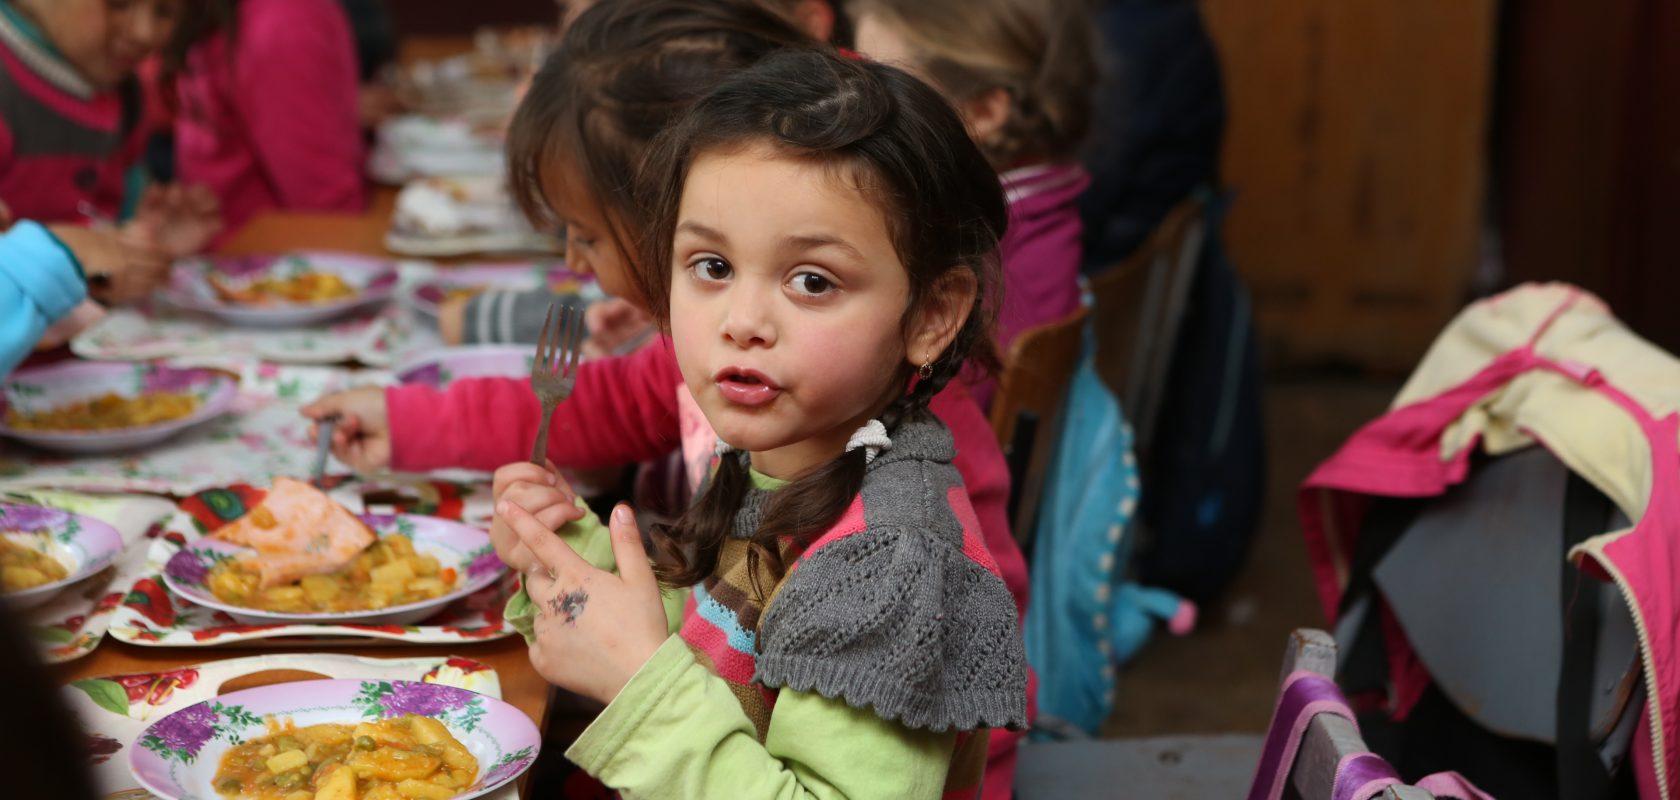 Romanian child